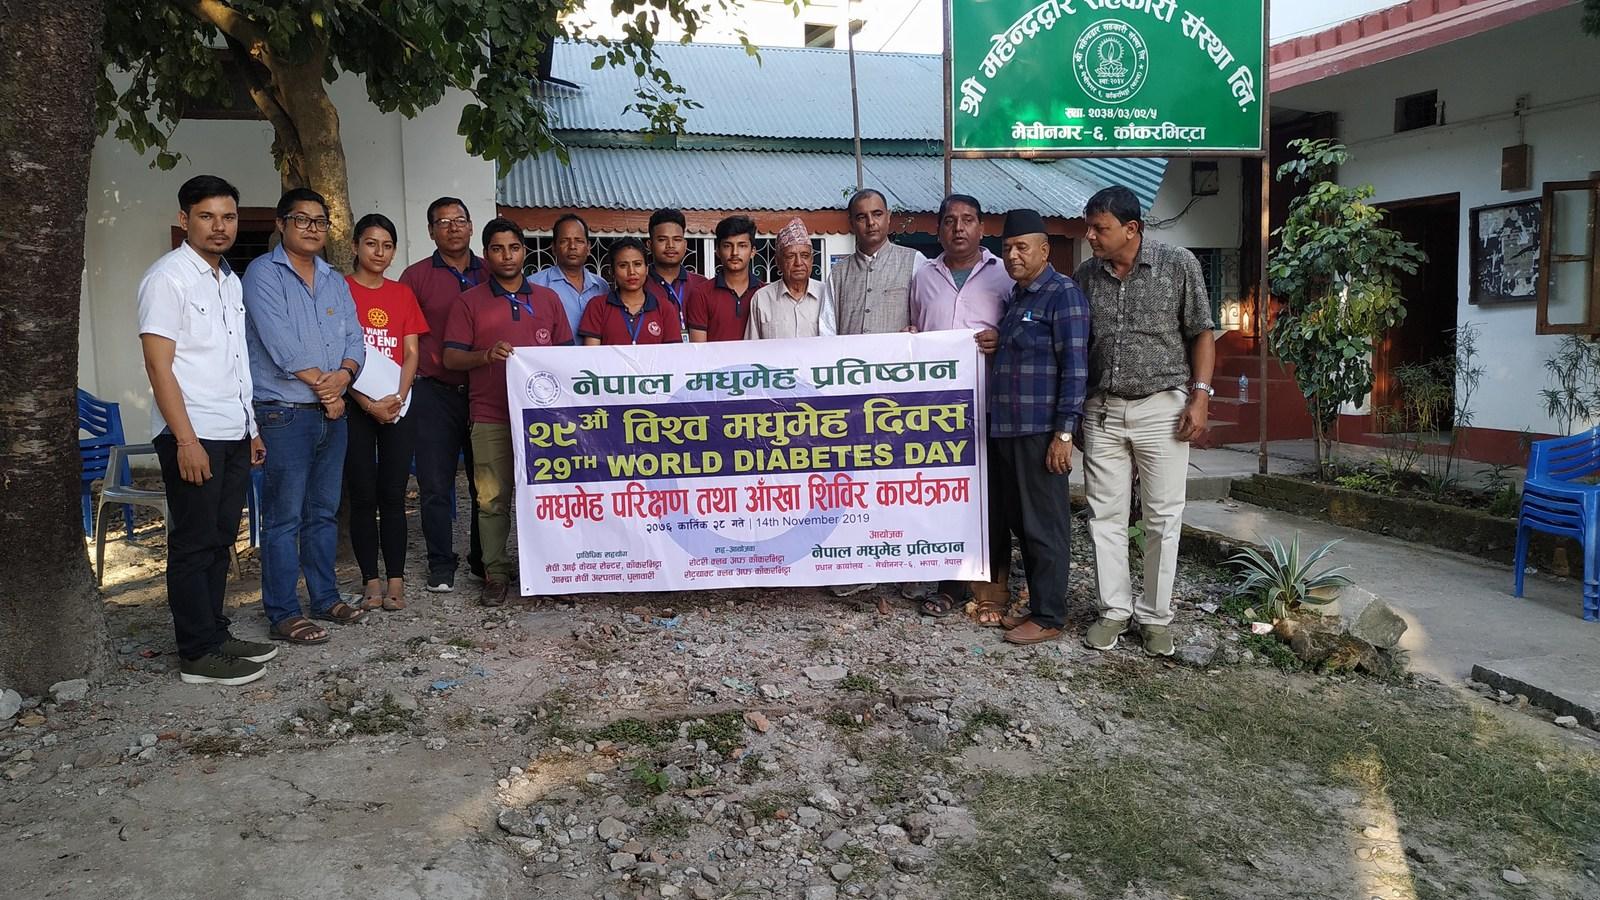 Diabetes Eye Screening Health Camp On 29th World Diabetes Day Rotary Club Of Kakarvitta 9